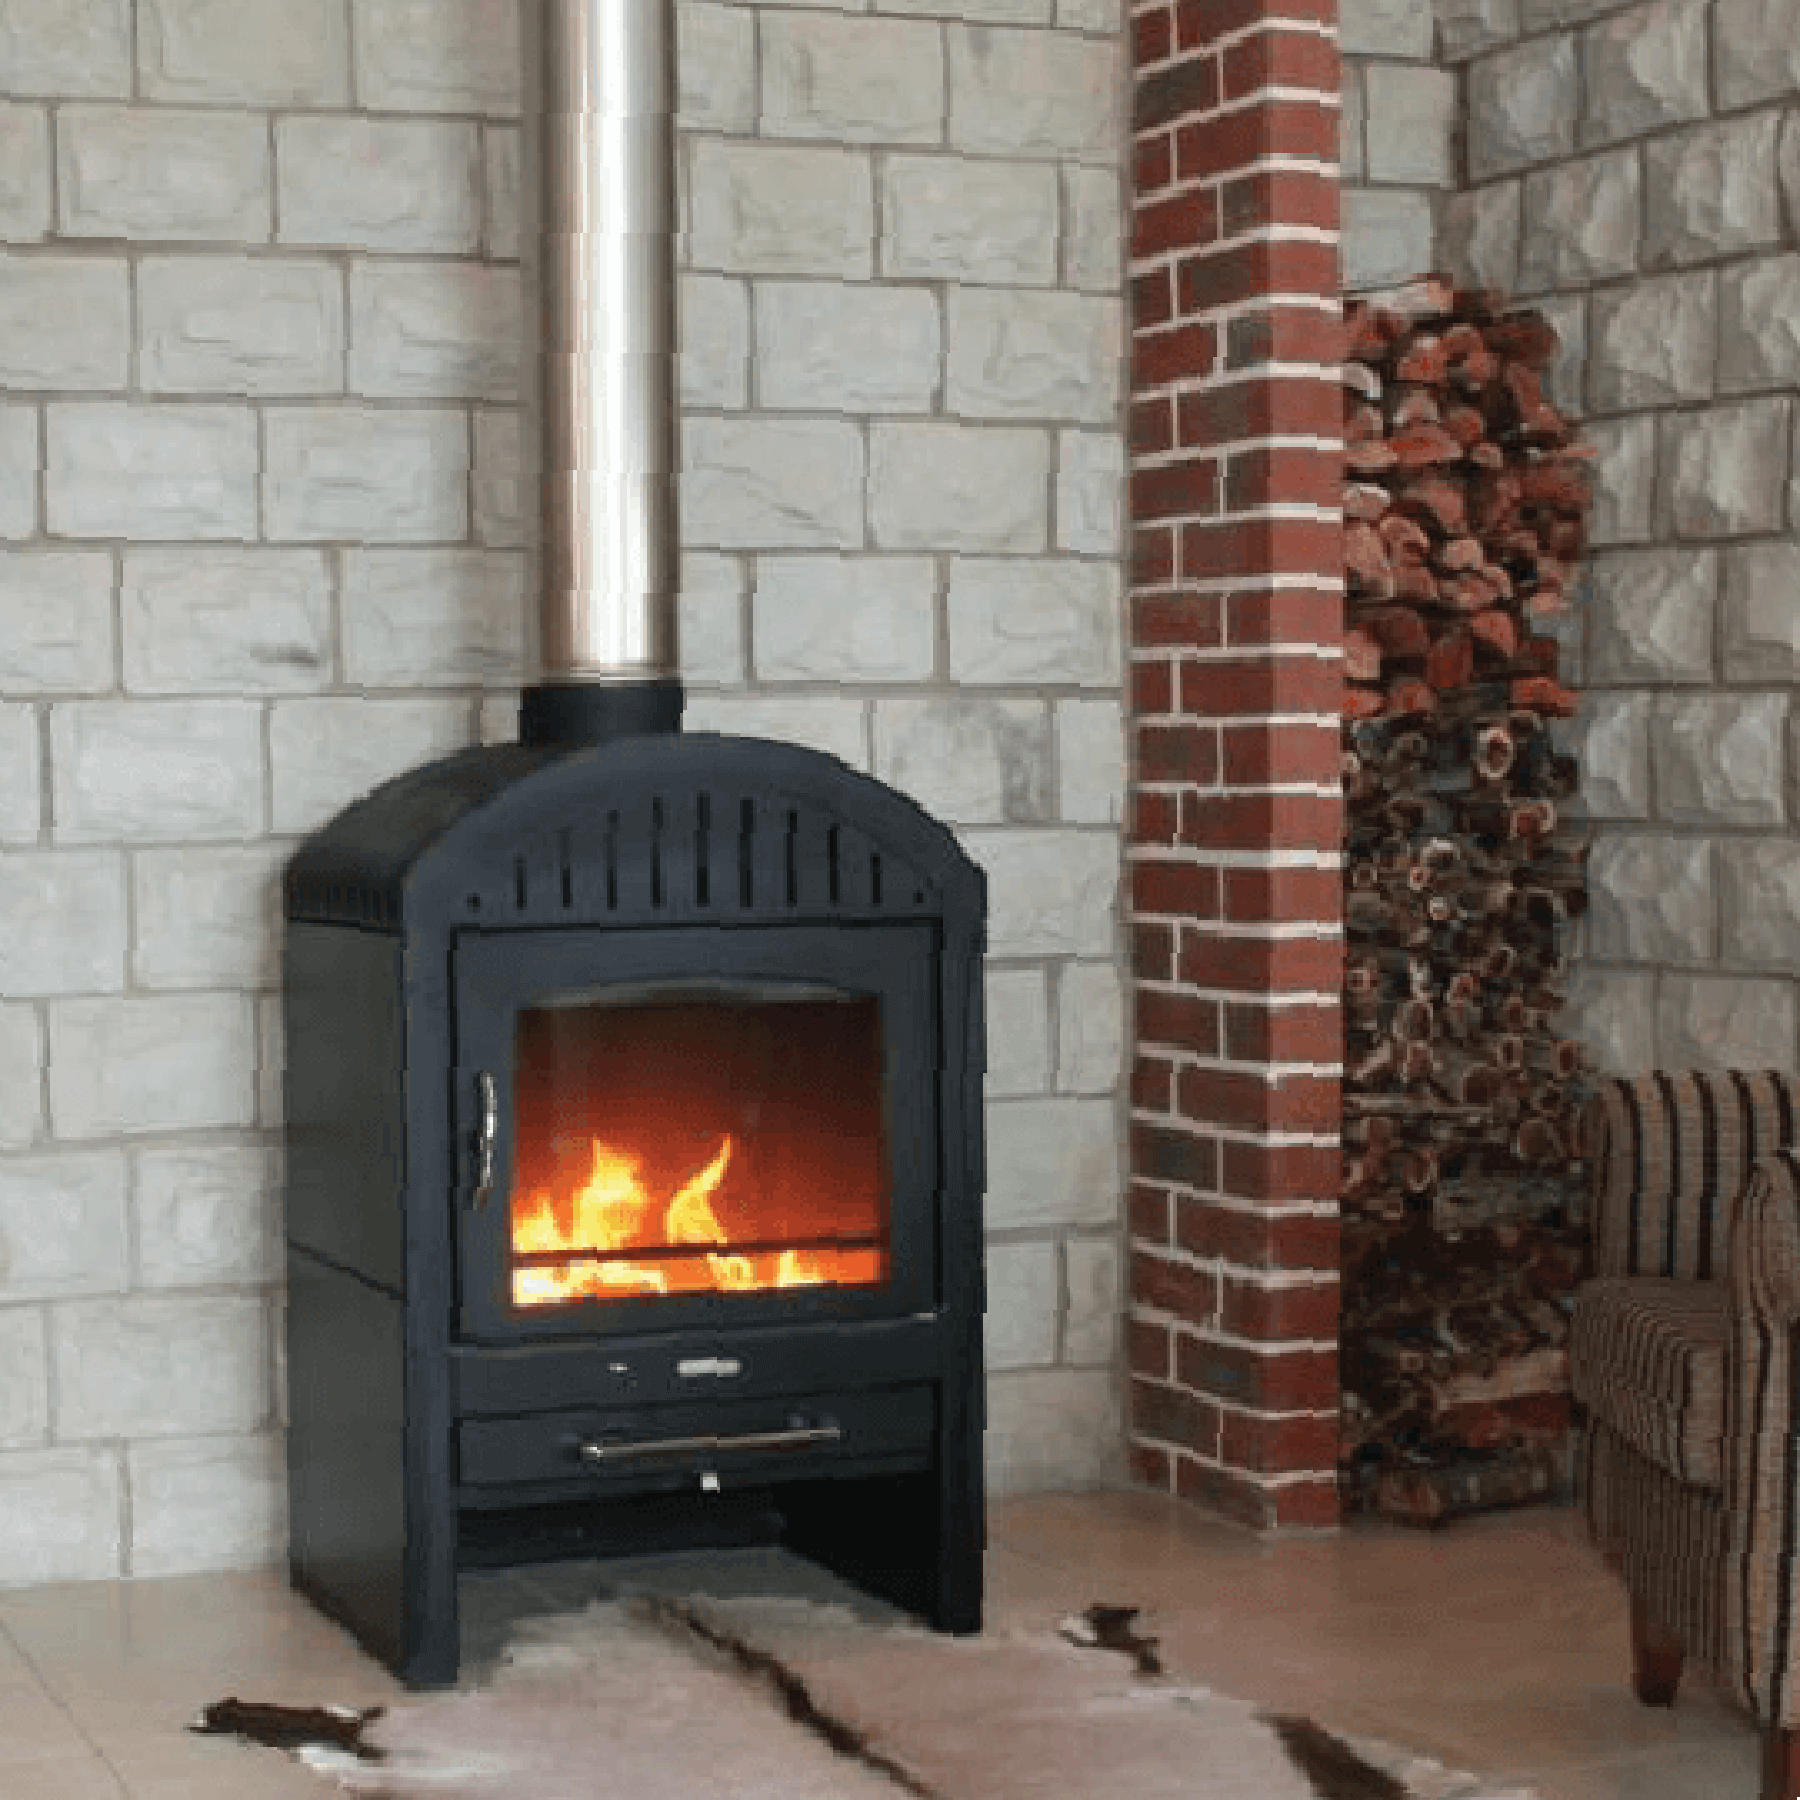 Combustion-Fireplaces-Freestanding-Da-Vinci